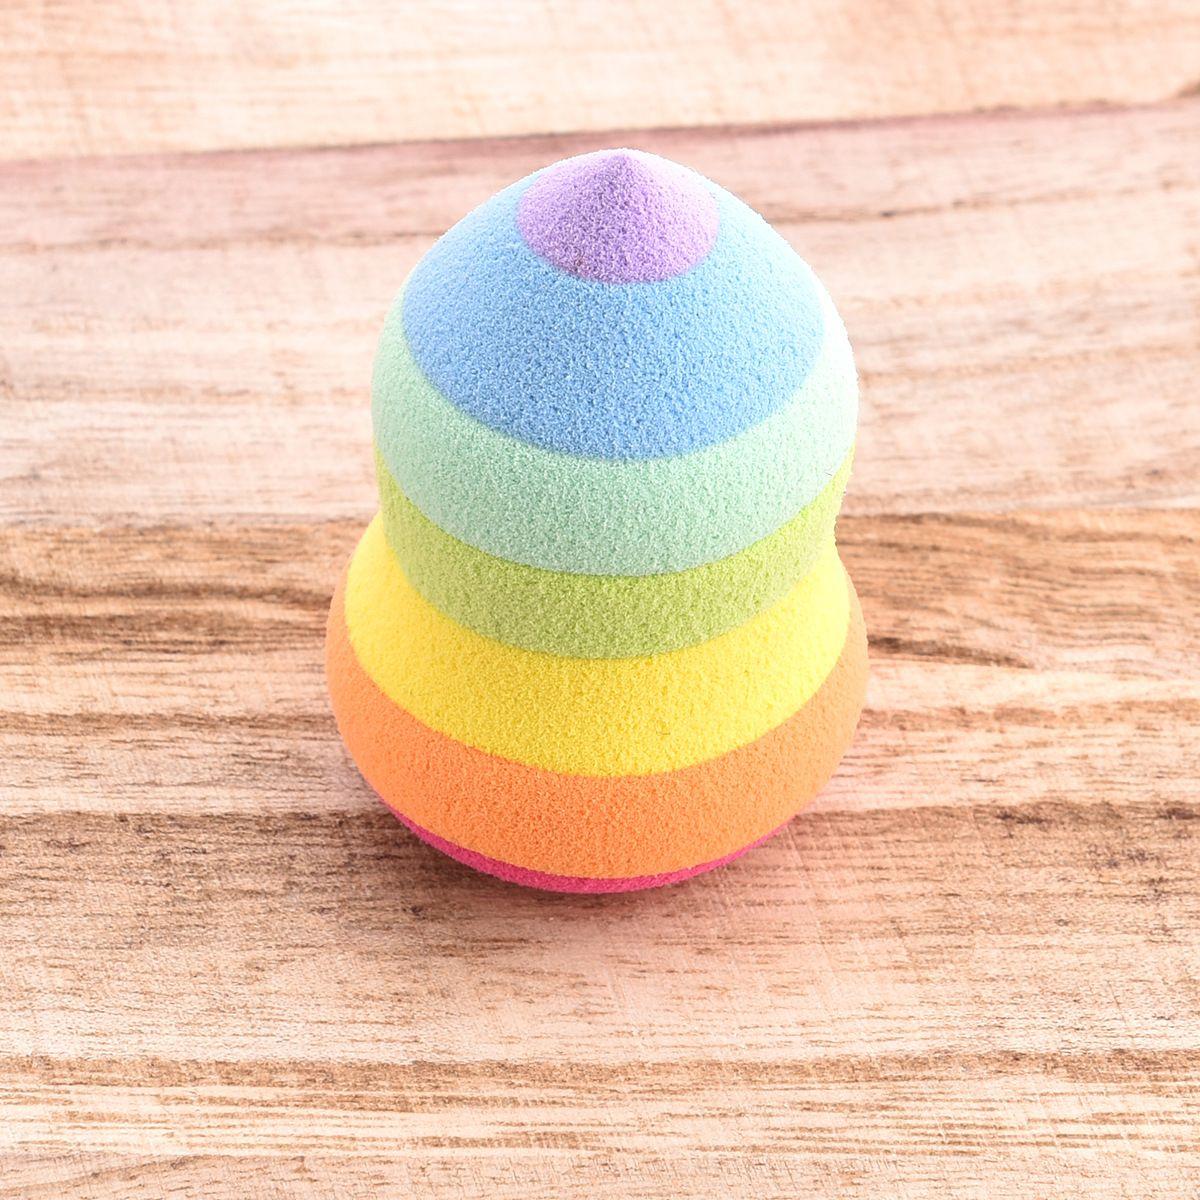 GUJHUI blender Waterdrop Makeup Sponge Puff BB Cream Cosmetic Puff Blending Foundation Make Up Tools